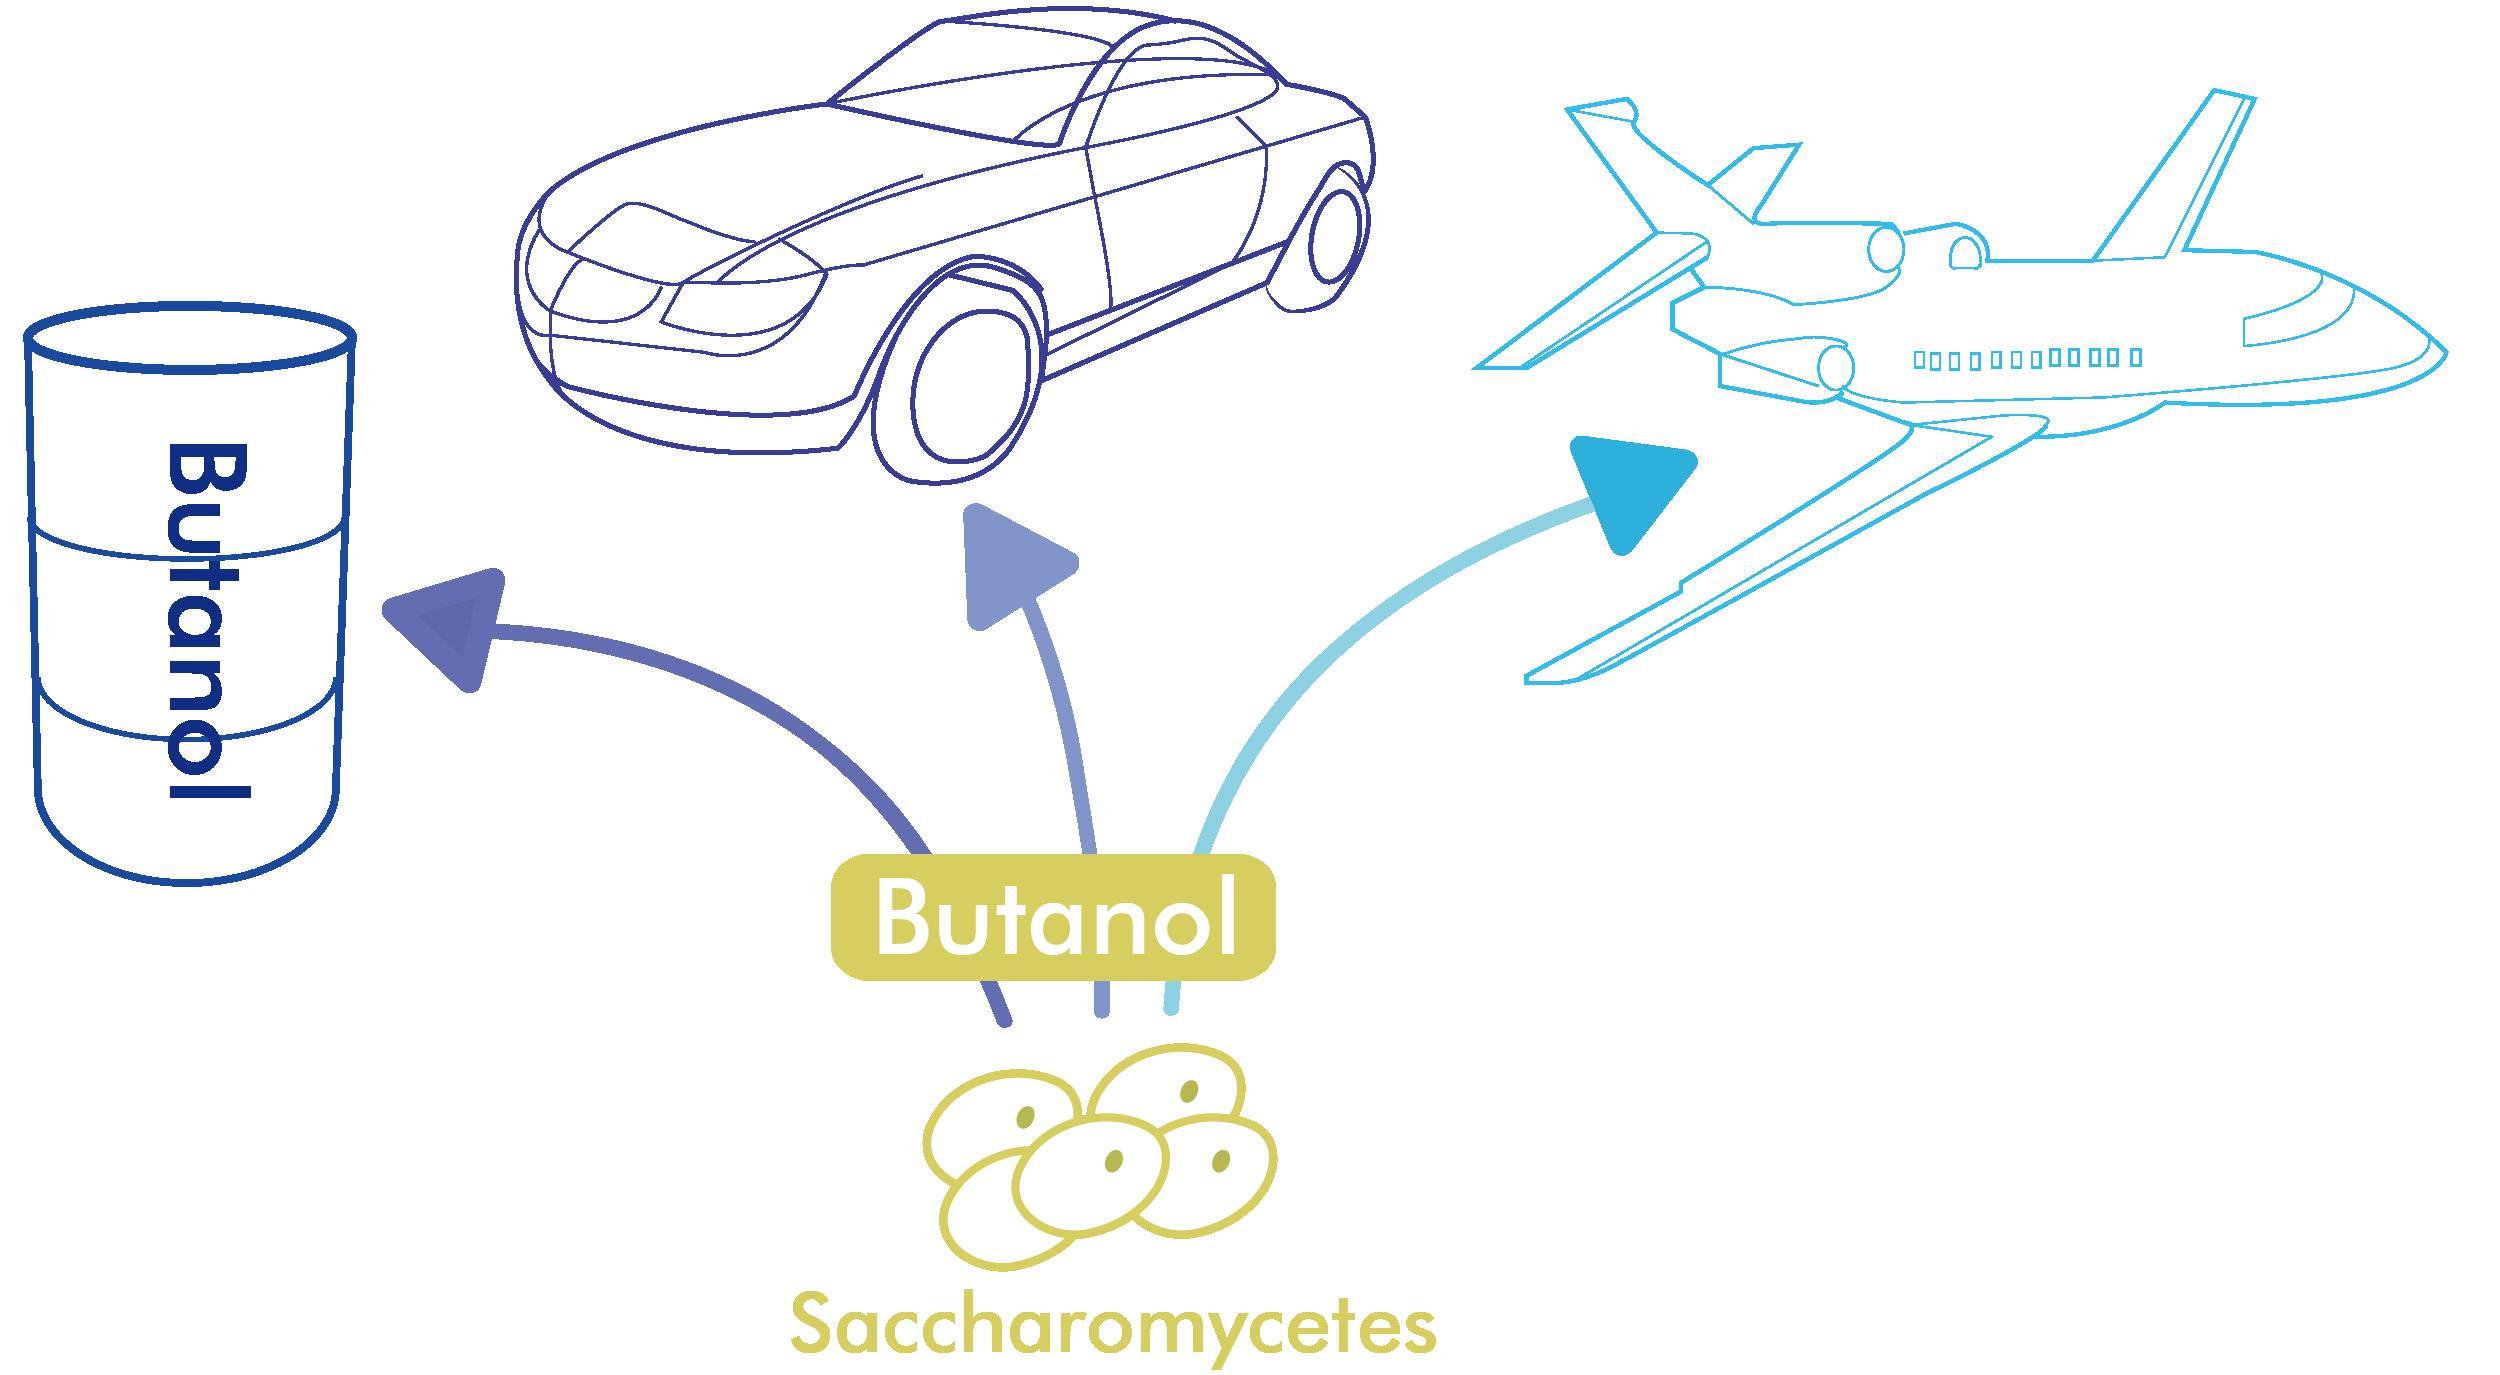 Biobutanol – Oakbio